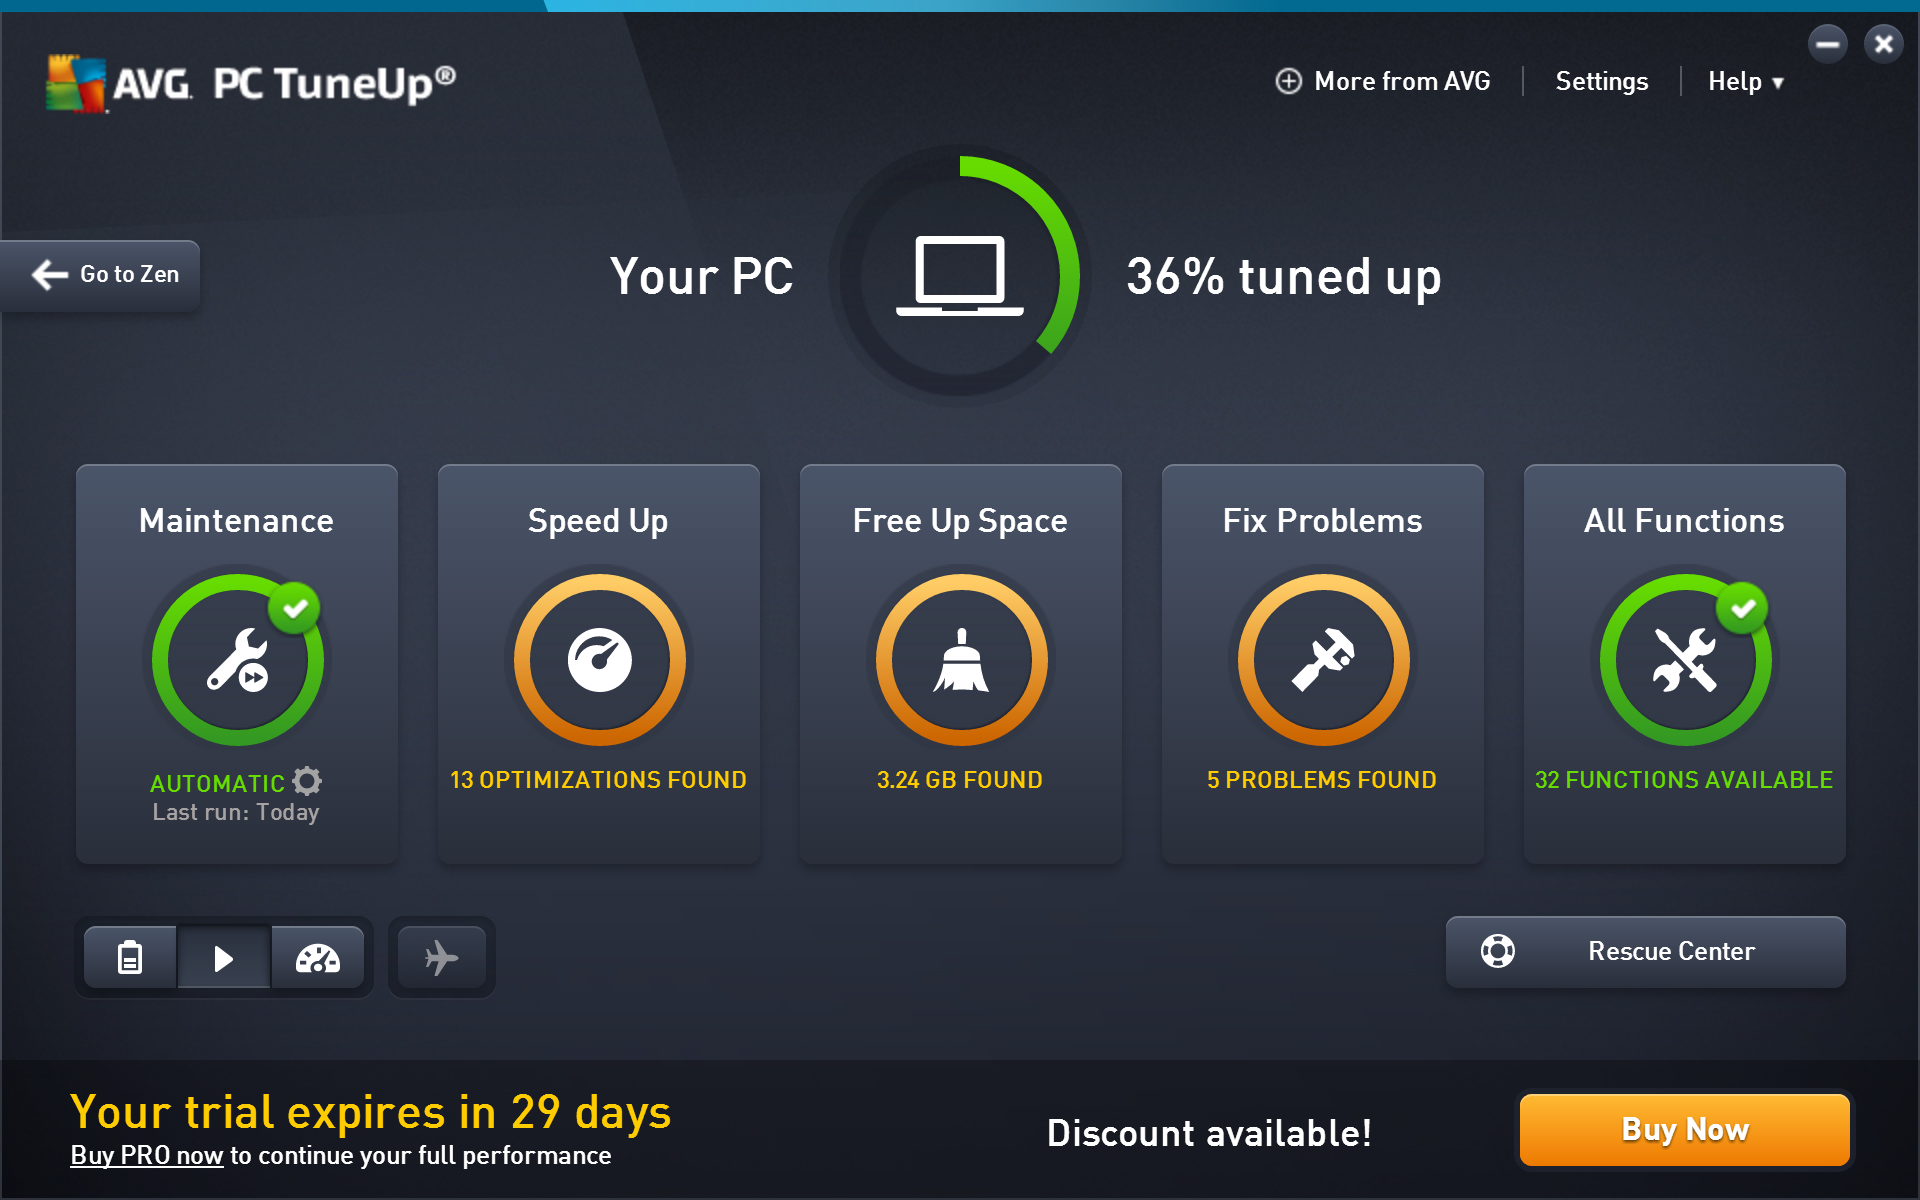 AVG PC TuneUp Utilities 2019 Crack + Keygen Full Version Free Download [Latest]